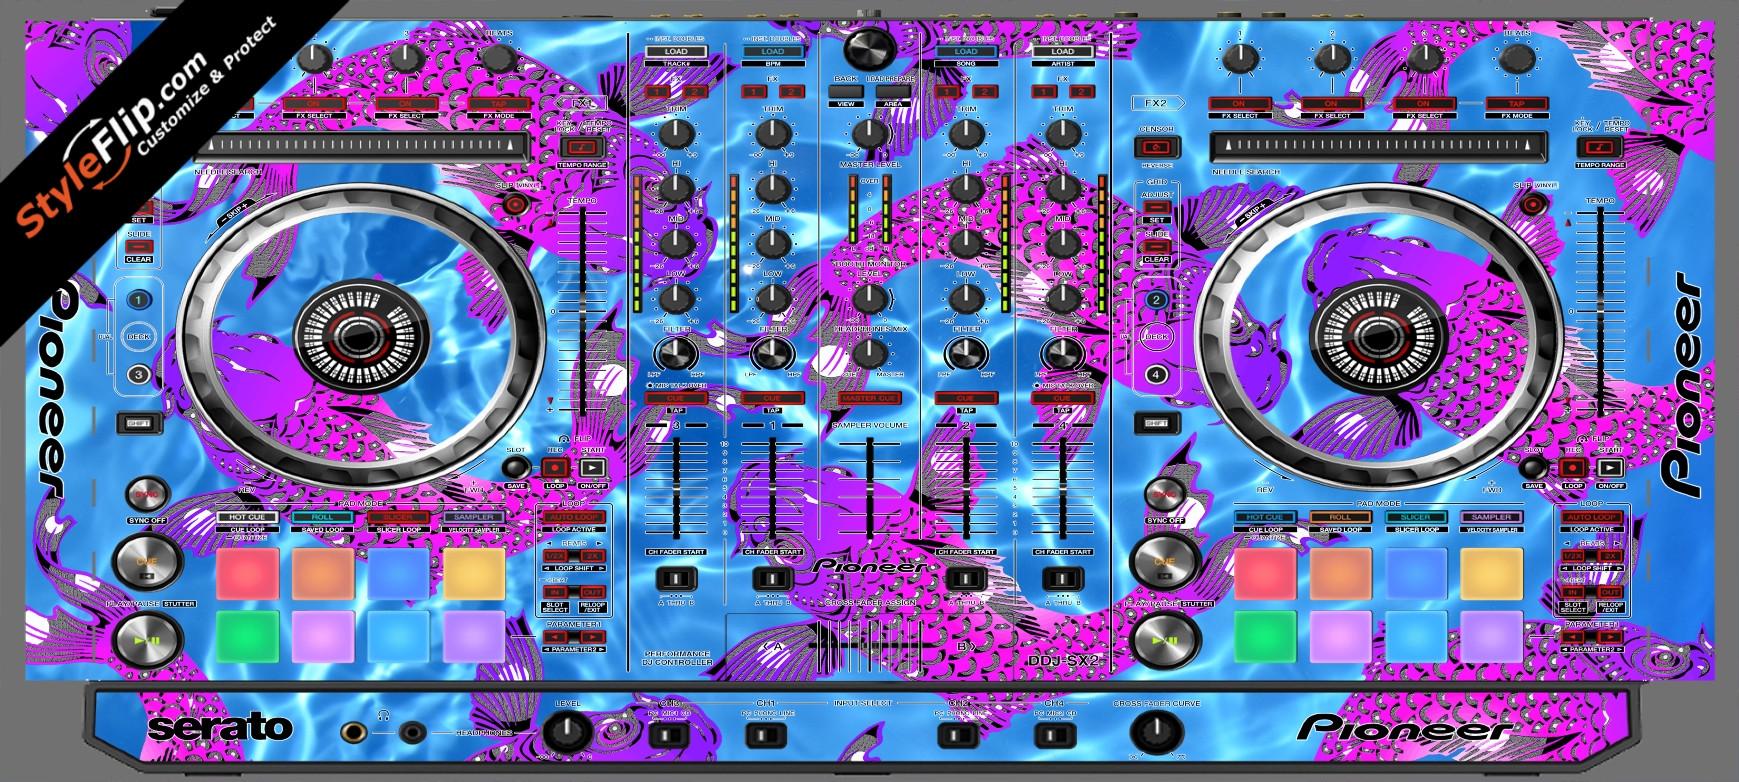 Koi Pioneer DDJ-SX2